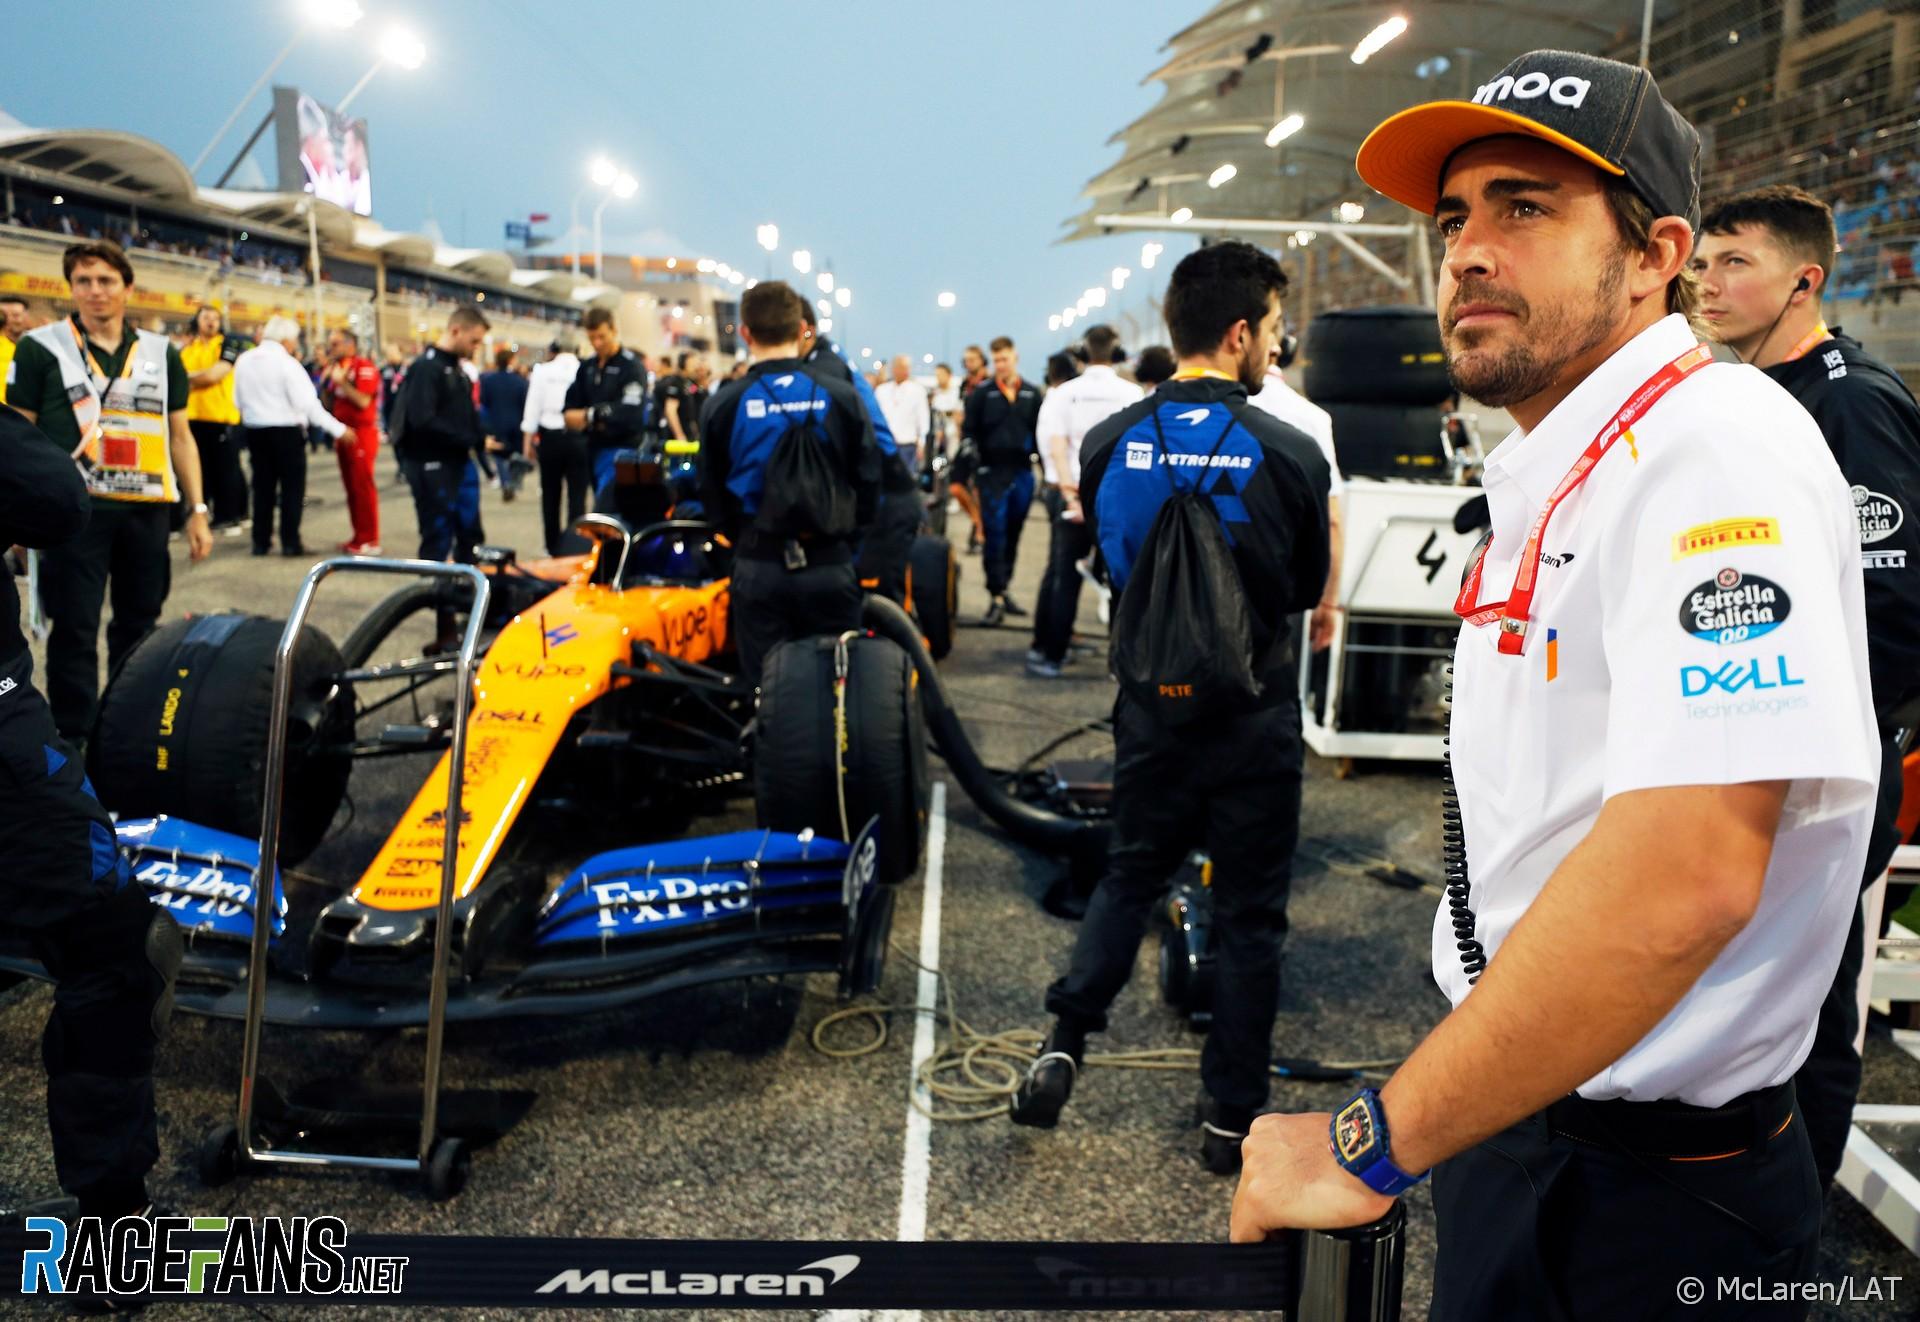 Fernando Alonso, McLaren, Bahrain International Circuit, 2019